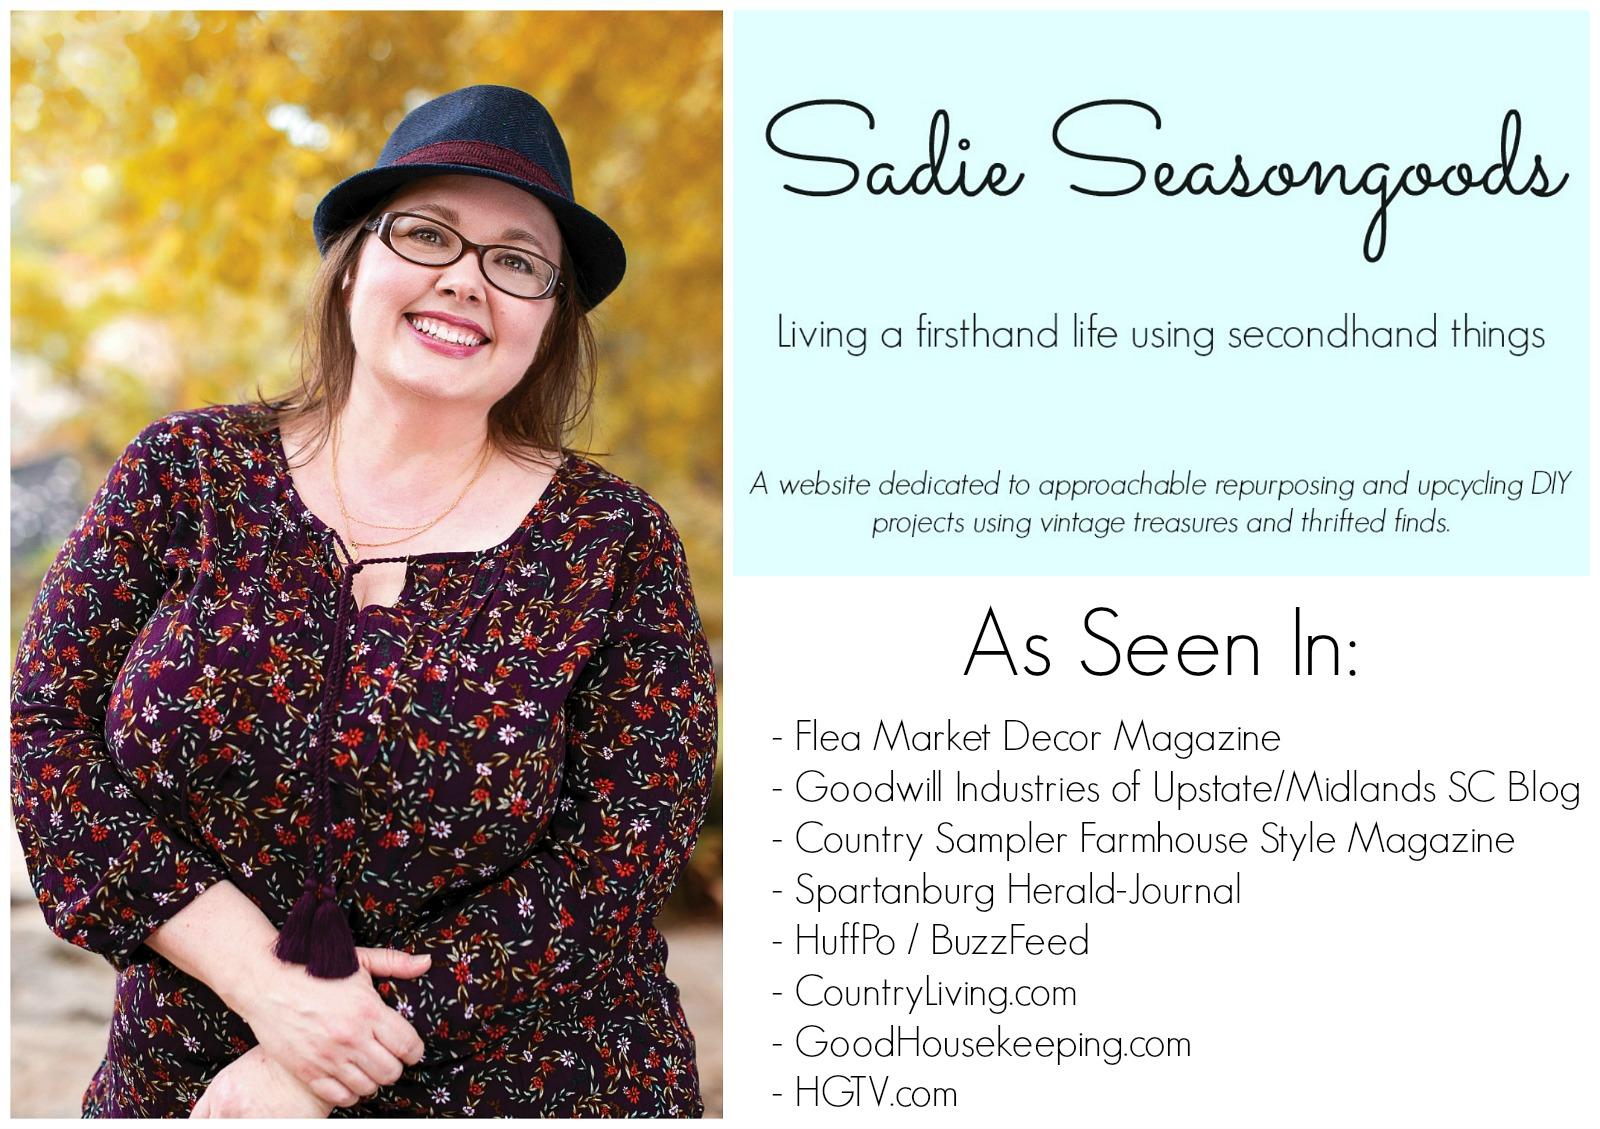 About Sadie Seasongoods